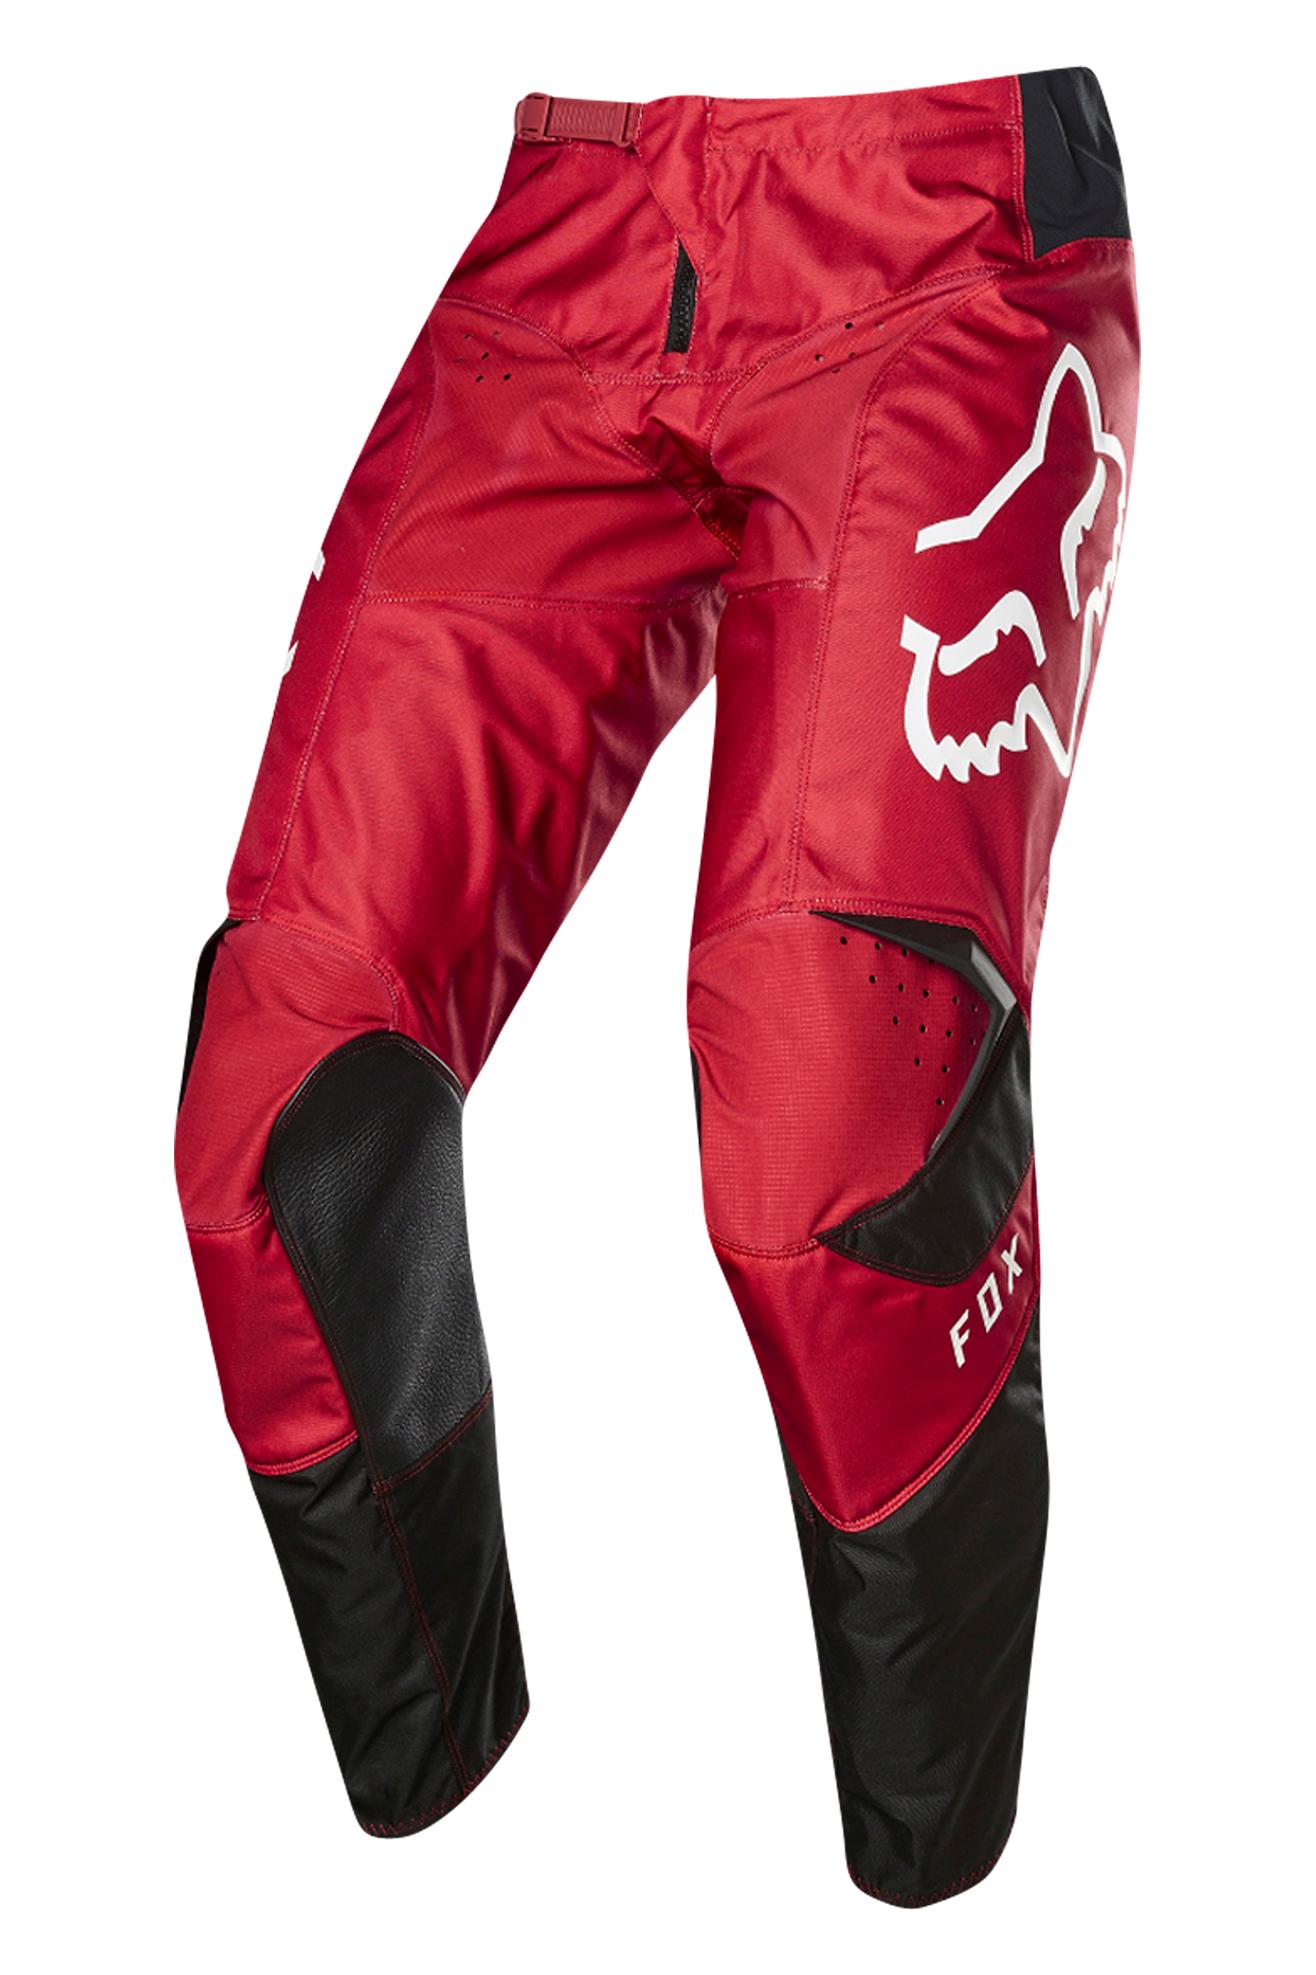 FOX Pantalones de Cross  180 Prix Niño Rojo Fuego